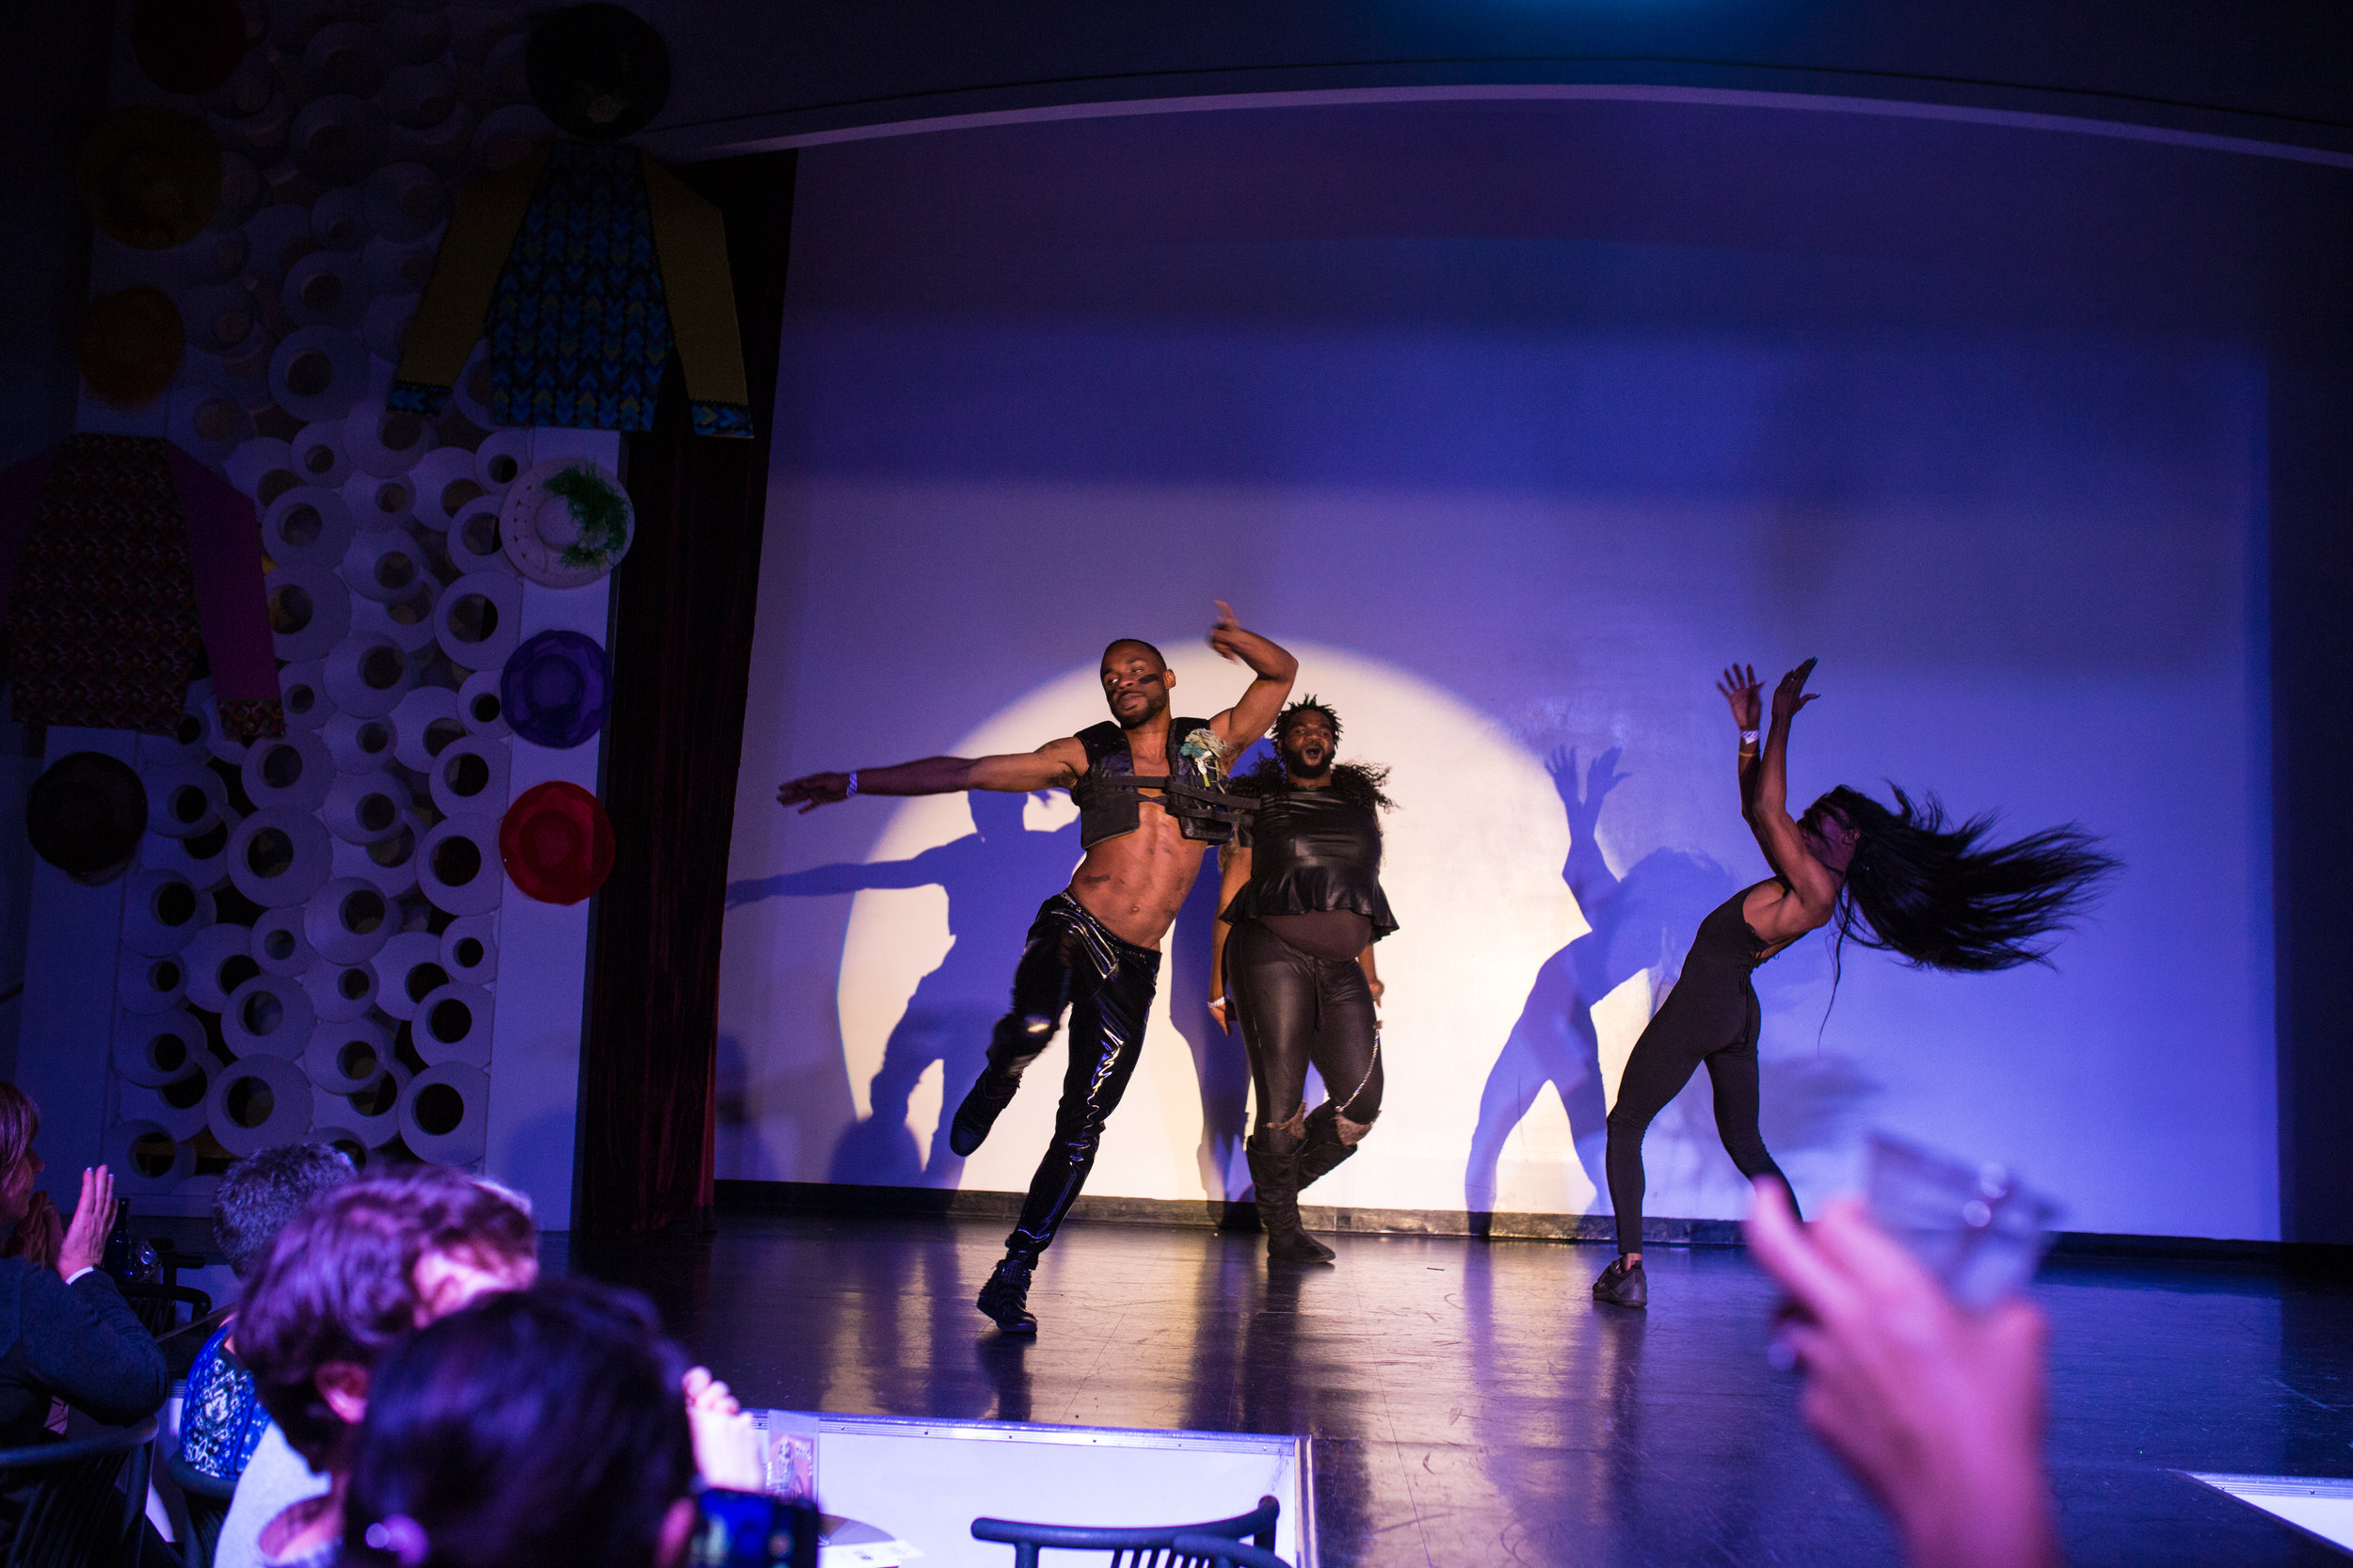 Rainbows & Roses Thurby 2017 WEBSITE FEVA PLAY Crystal Ludwick Photo 175.jpg